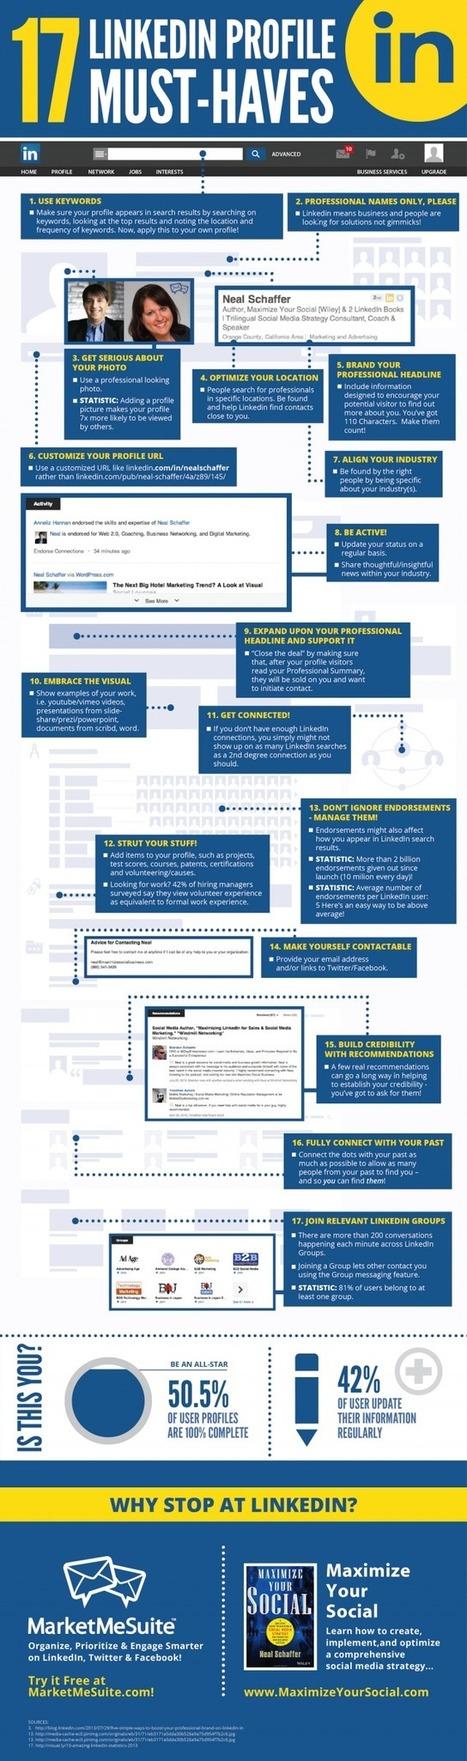 LinkedIn Profile Must Have 17 Tips | Digital Marketing Startegy | Technology | SEO | Social Media | Scoop.it